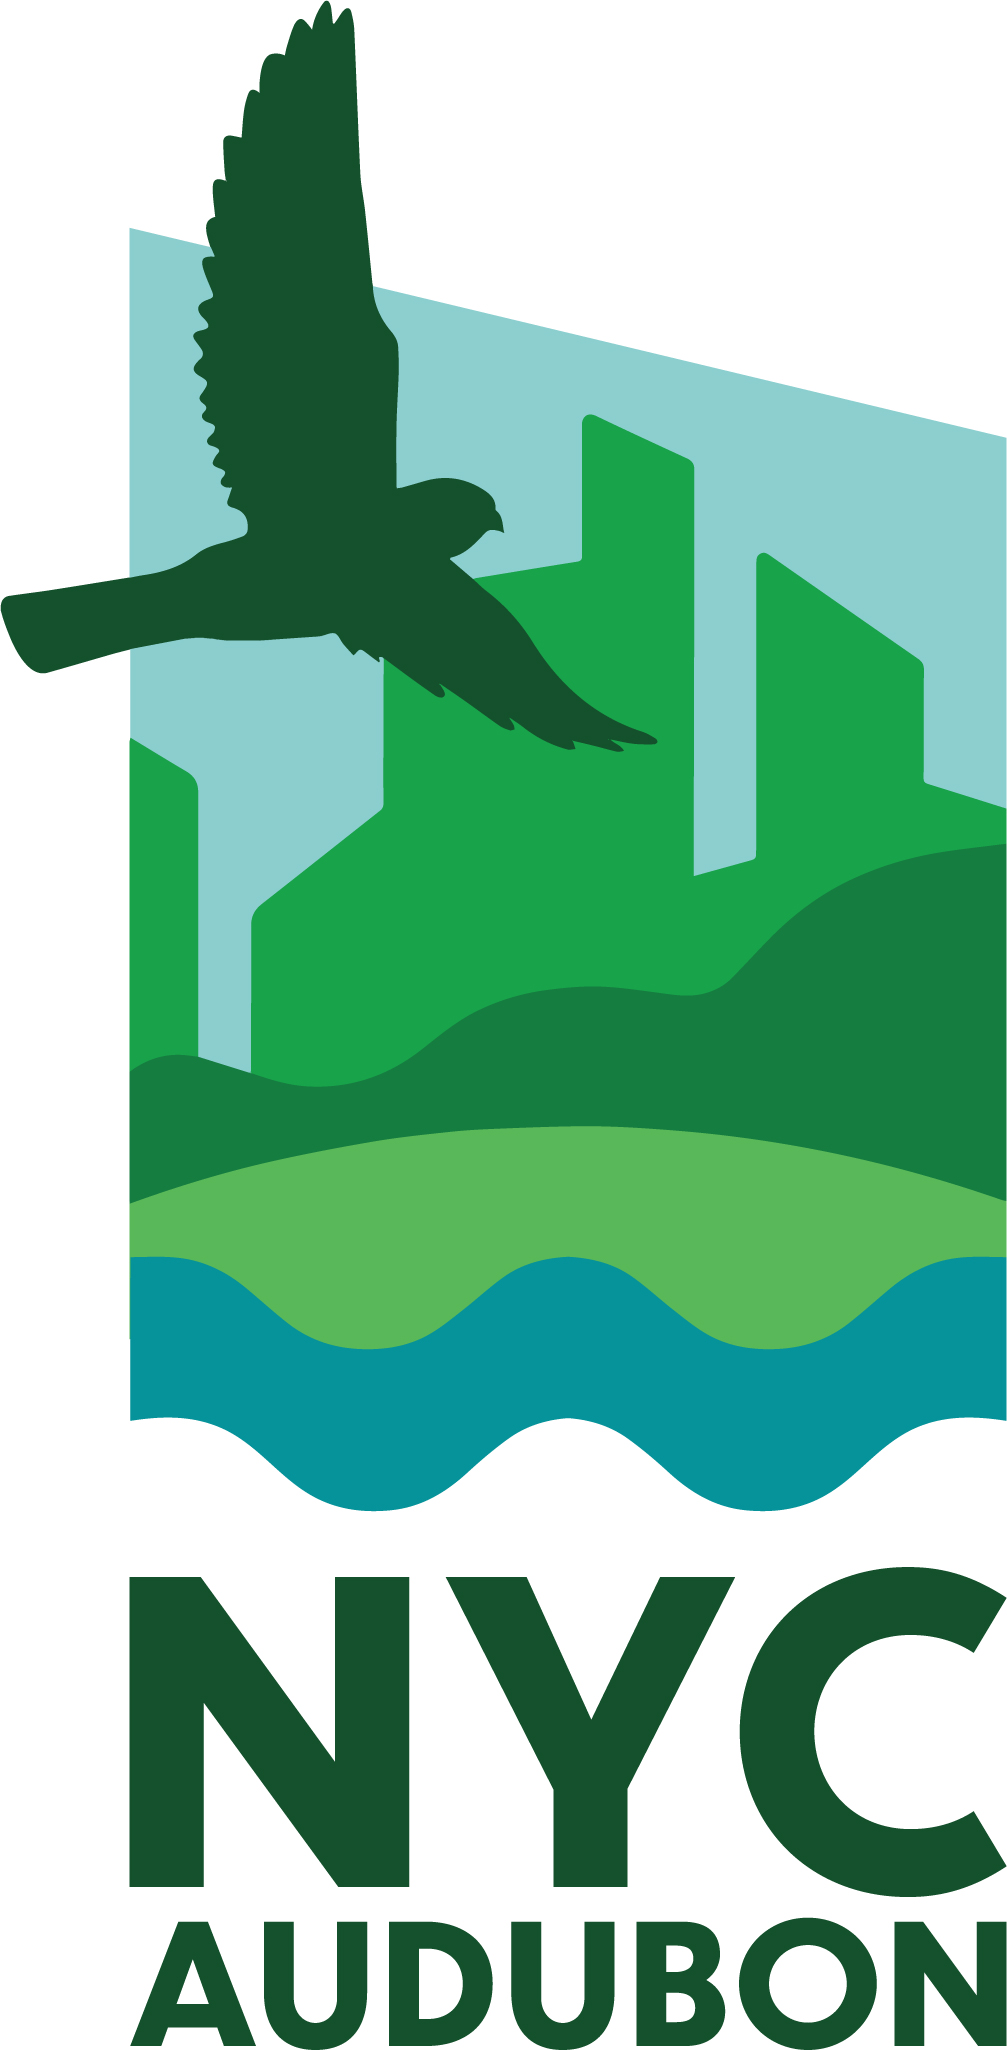 New York City Audubon Society Inc.